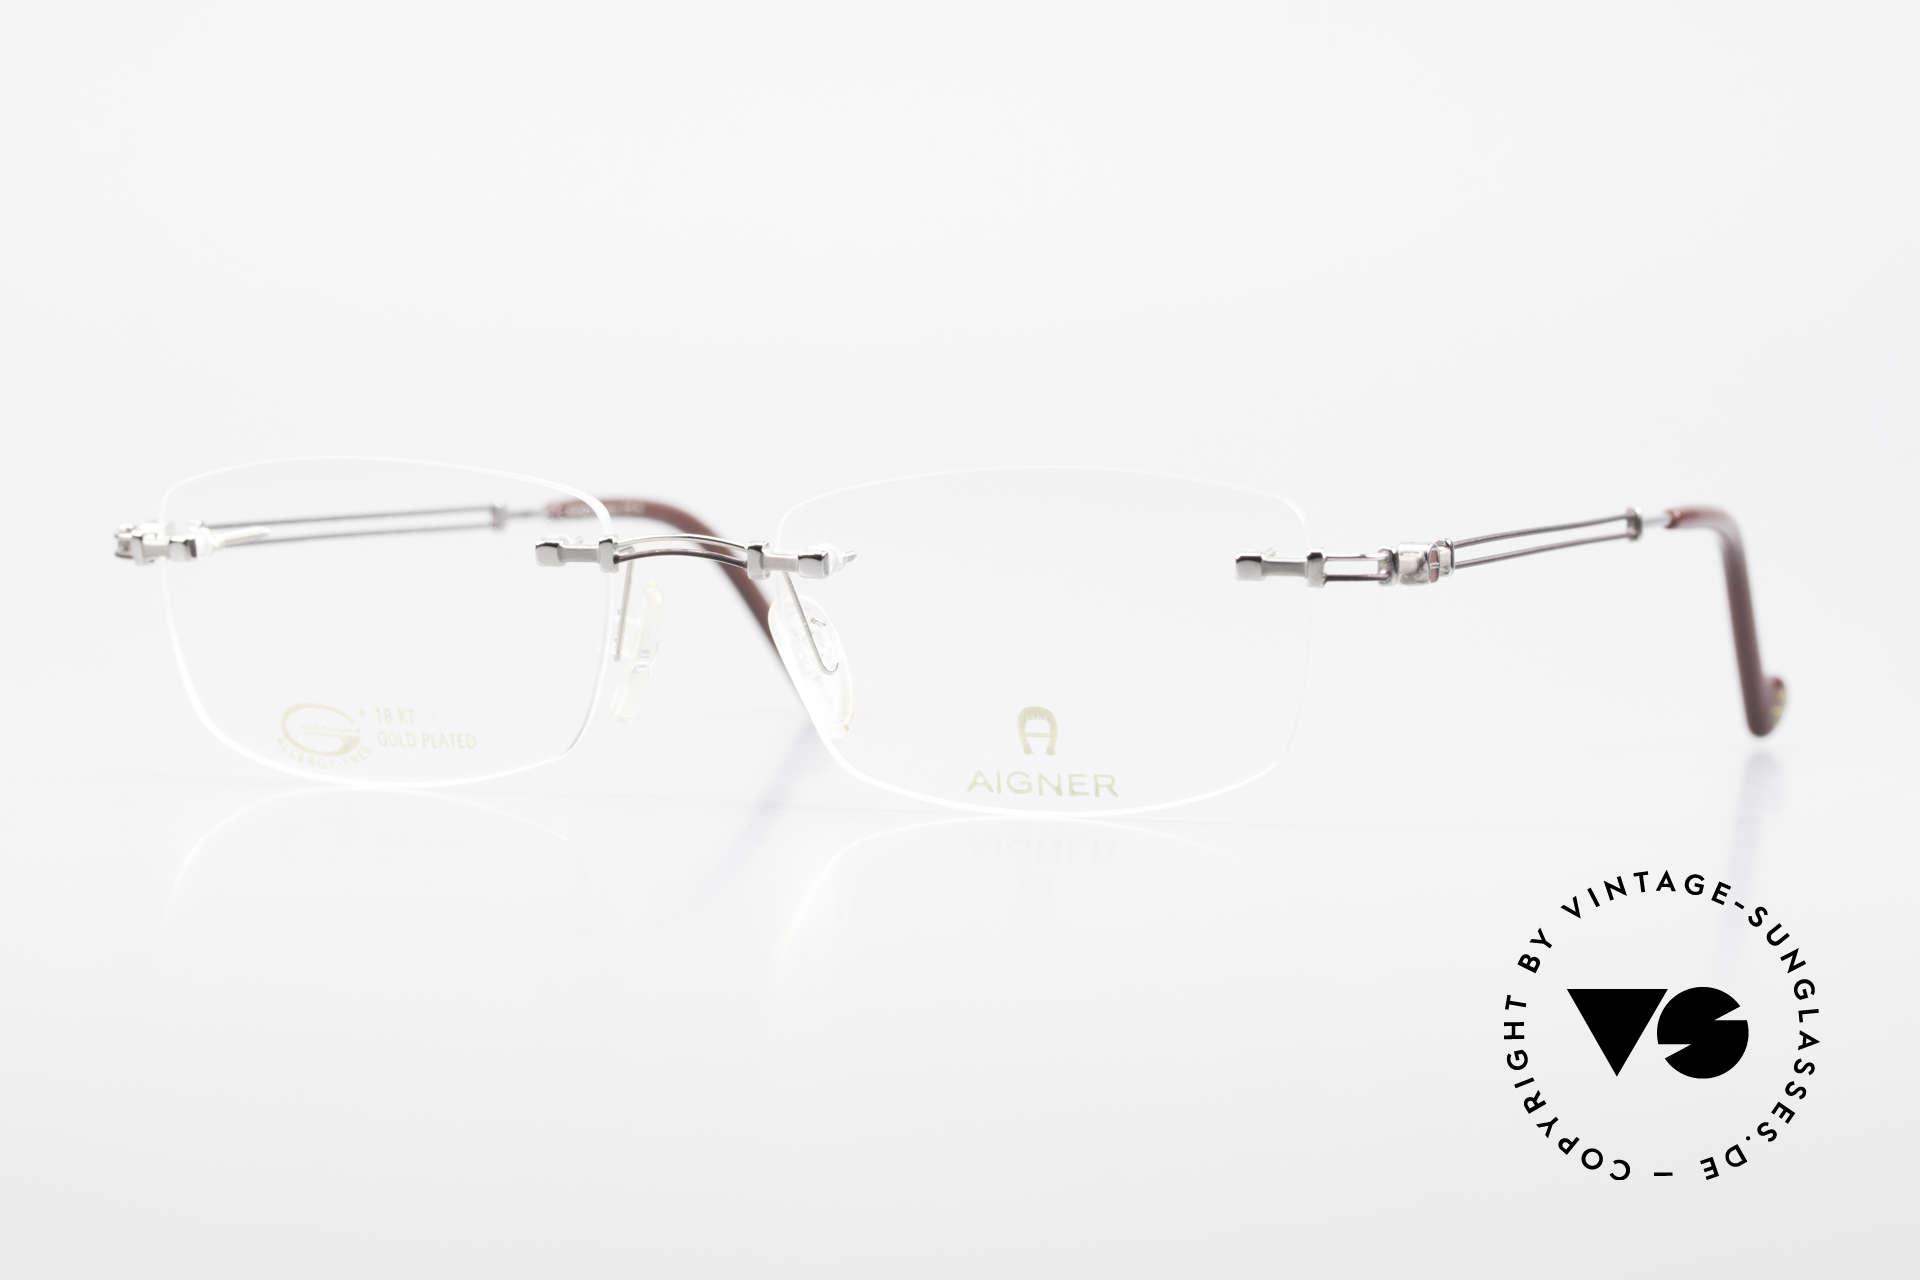 Aigner EA498 Randlose Vintage Brille 90er, randlose Aigner VINTAGE Brille, EA498, Gr. 53/18, 140, Passend für Herren und Damen